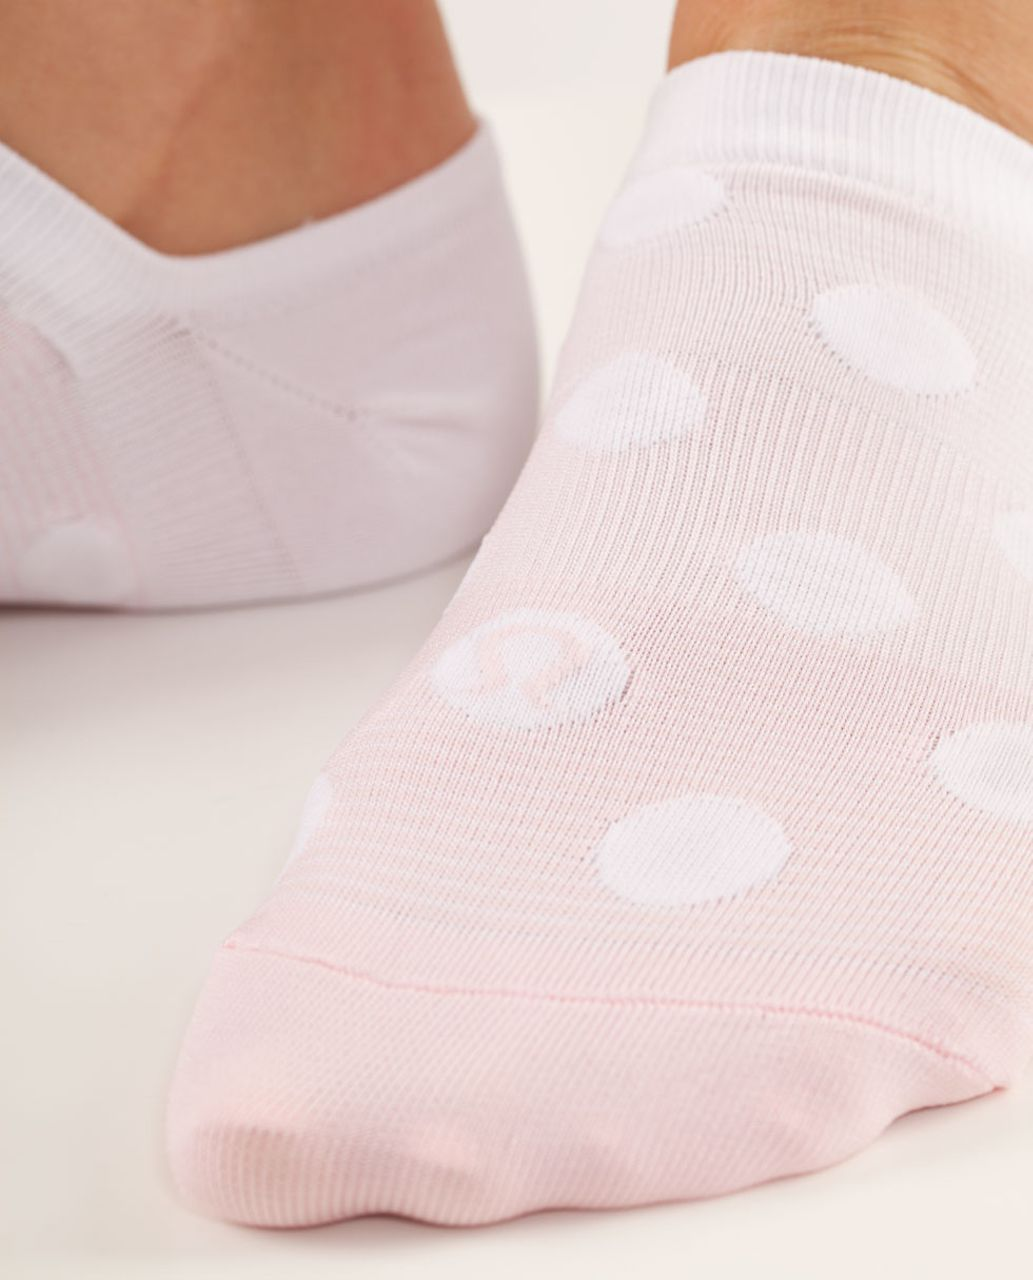 Lululemon Women's Featherweight Sock - Blush Quartz / Blush Quartz Gradient Dot